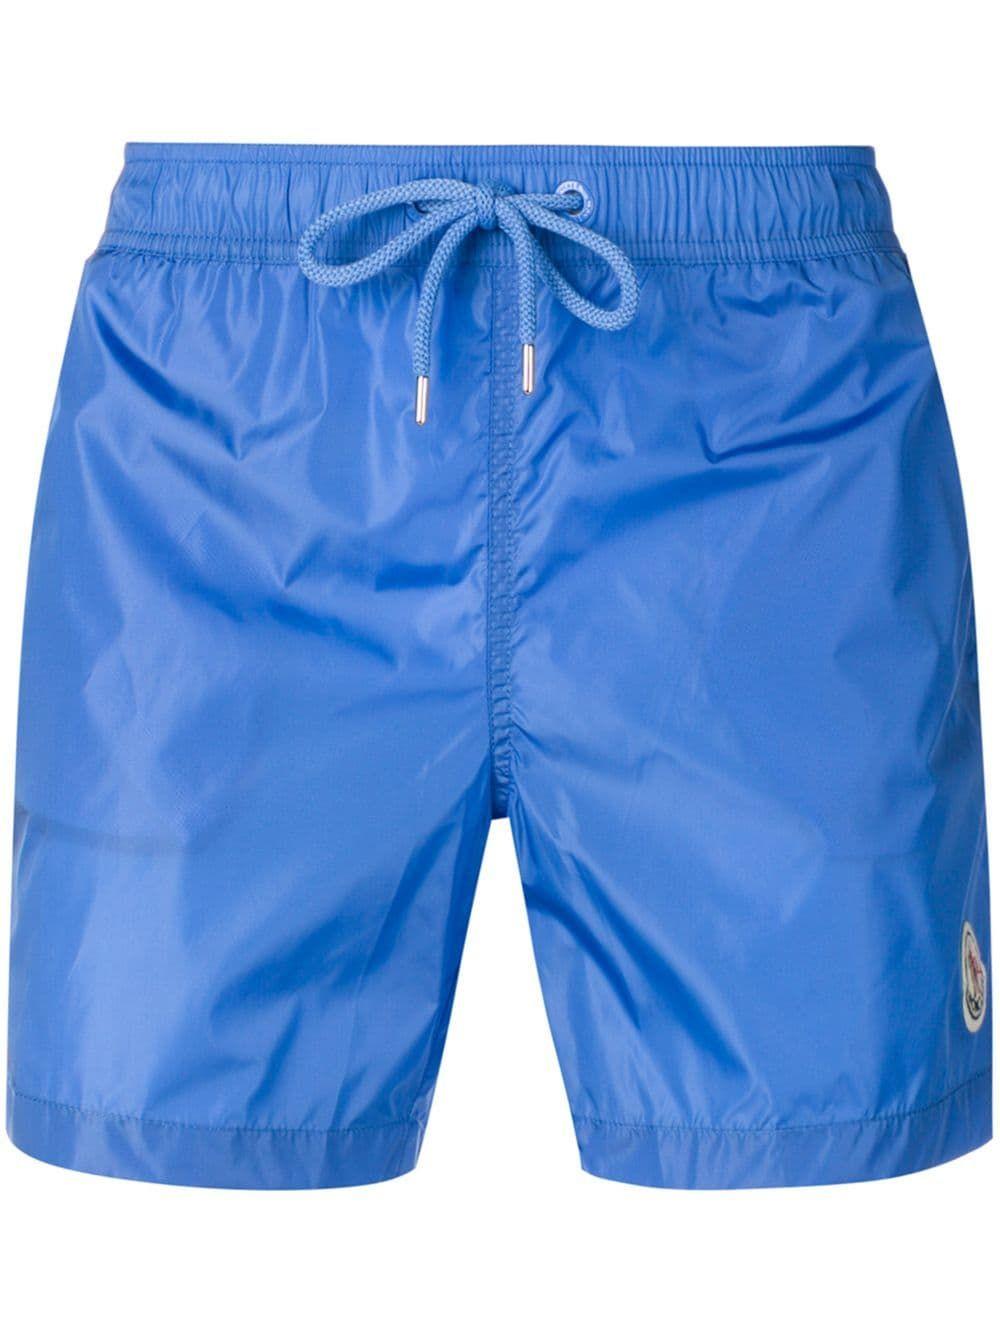 f32b2afa25 MONCLER MONCLER SIDE LOGO SWIM SHORTS - BLUE. #moncler #cloth ...